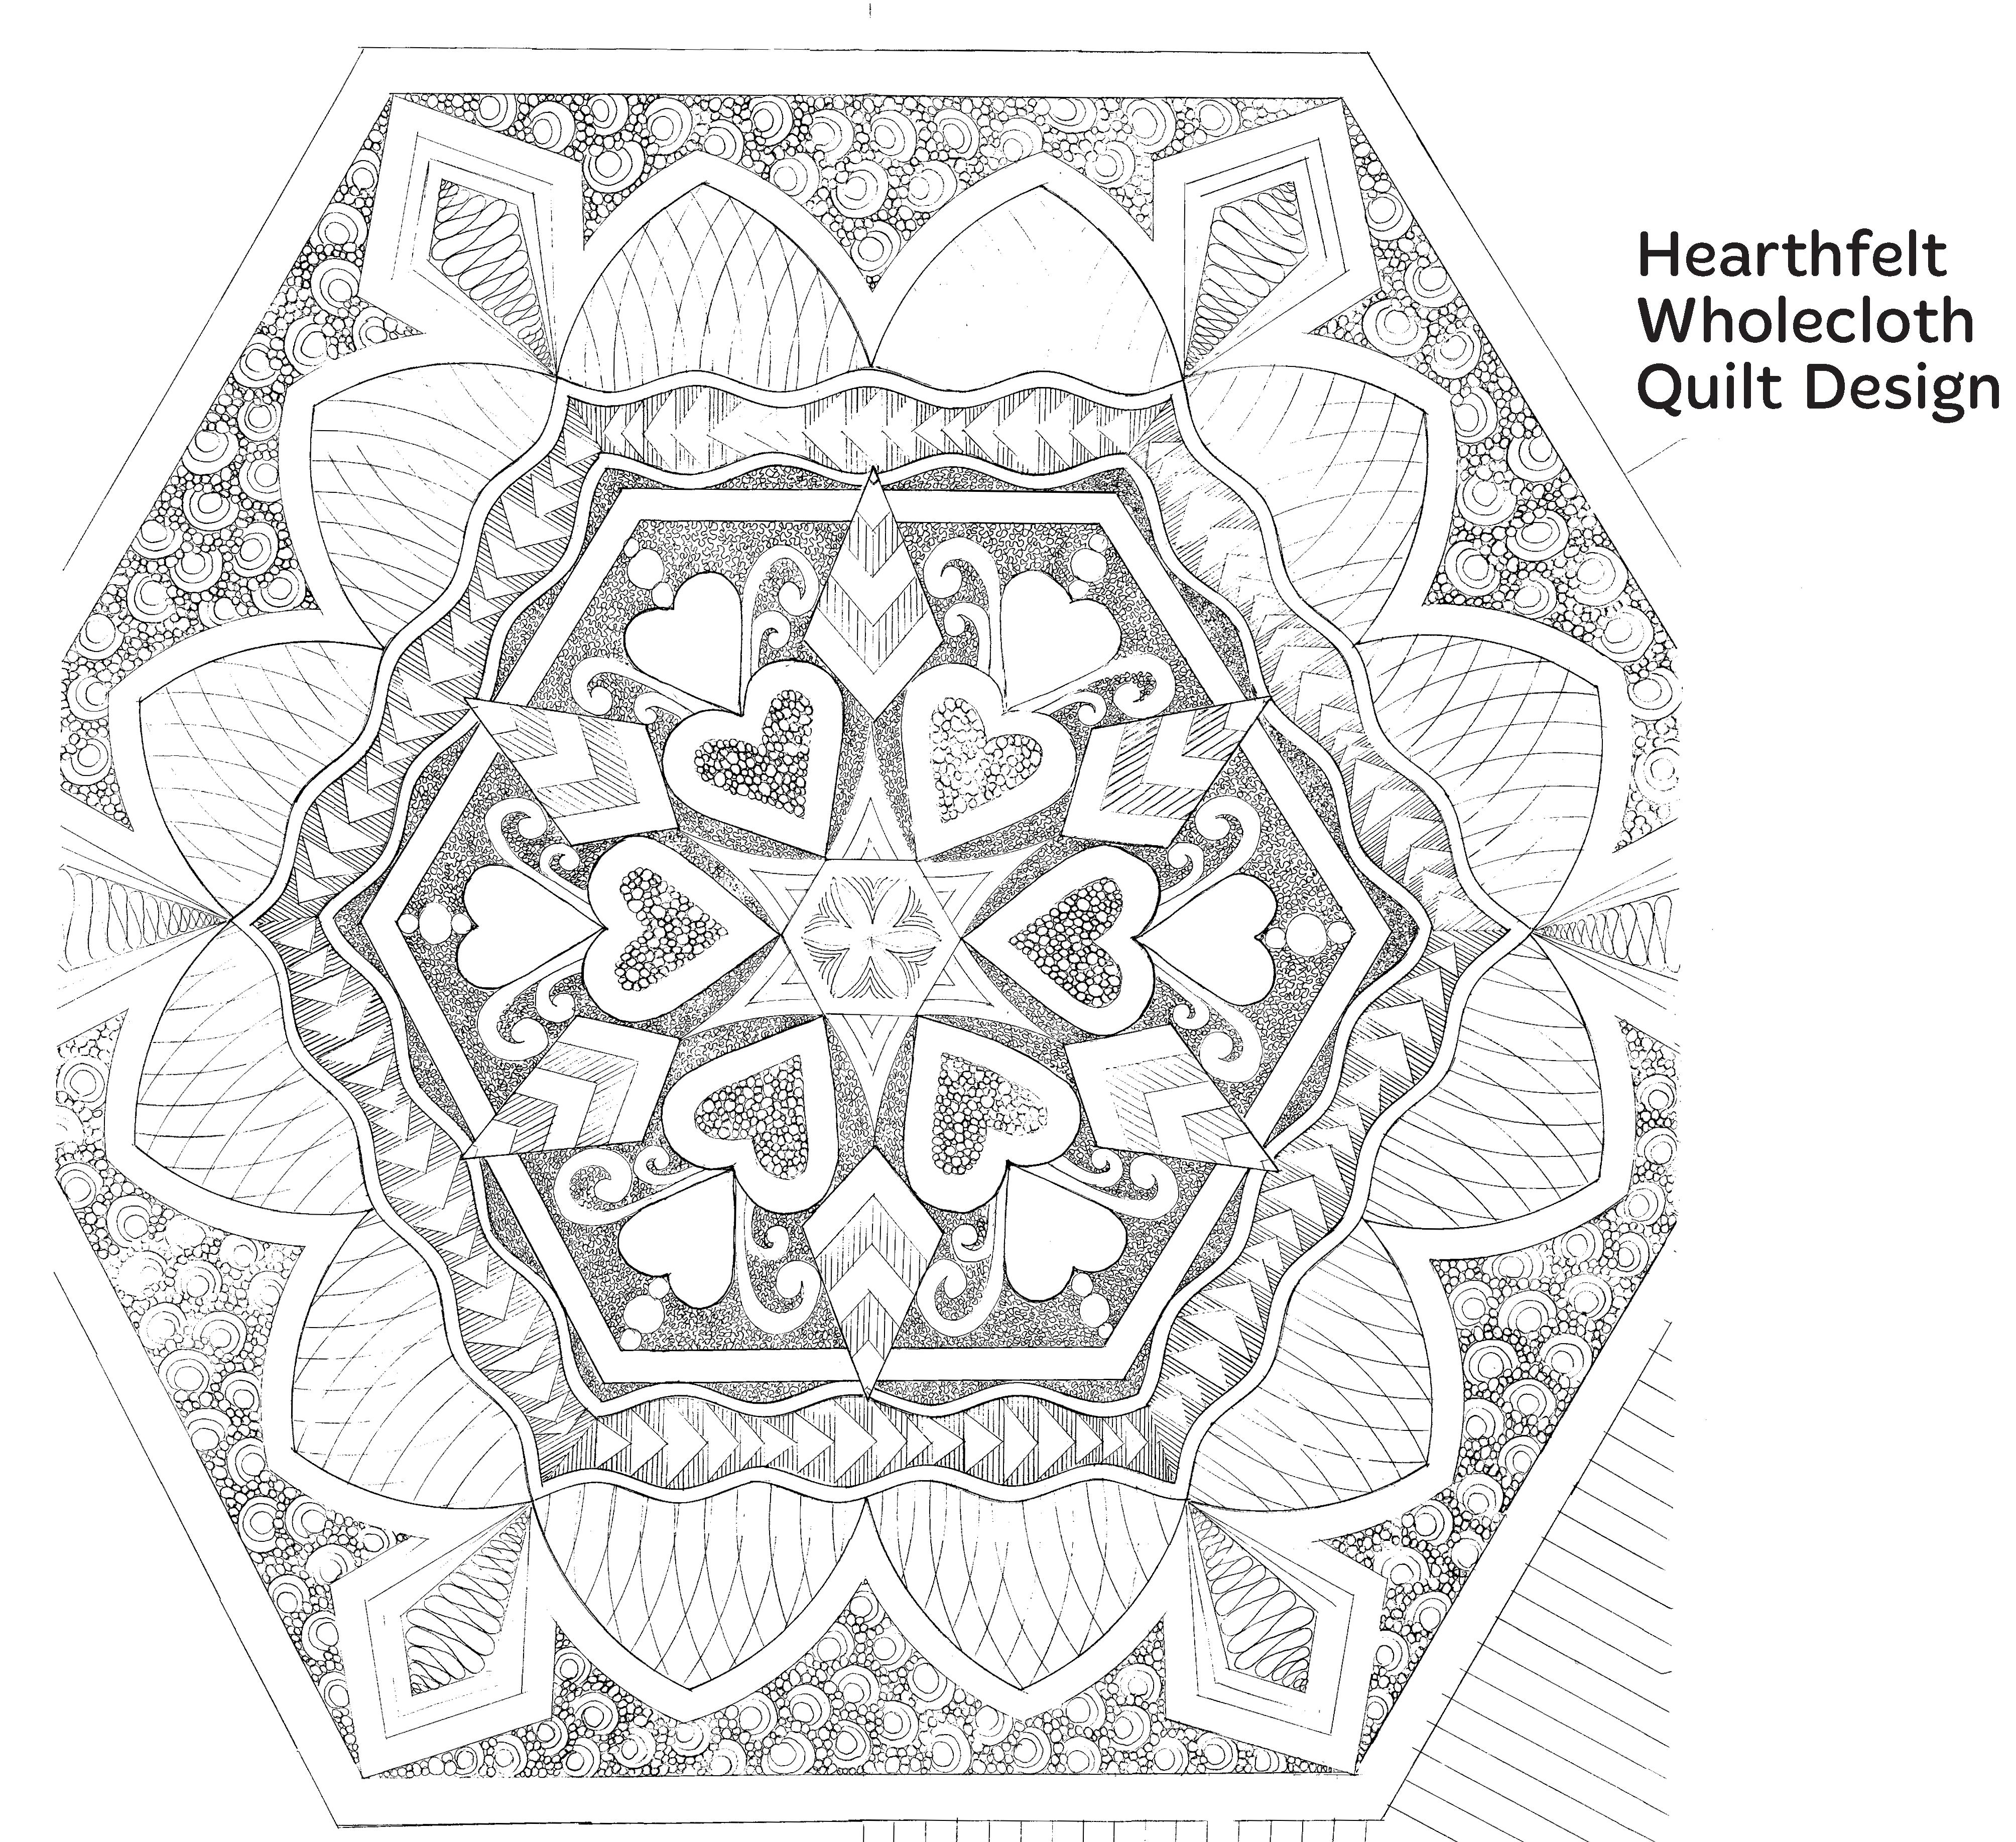 Hearthfelt Wholecloth Quilt Design